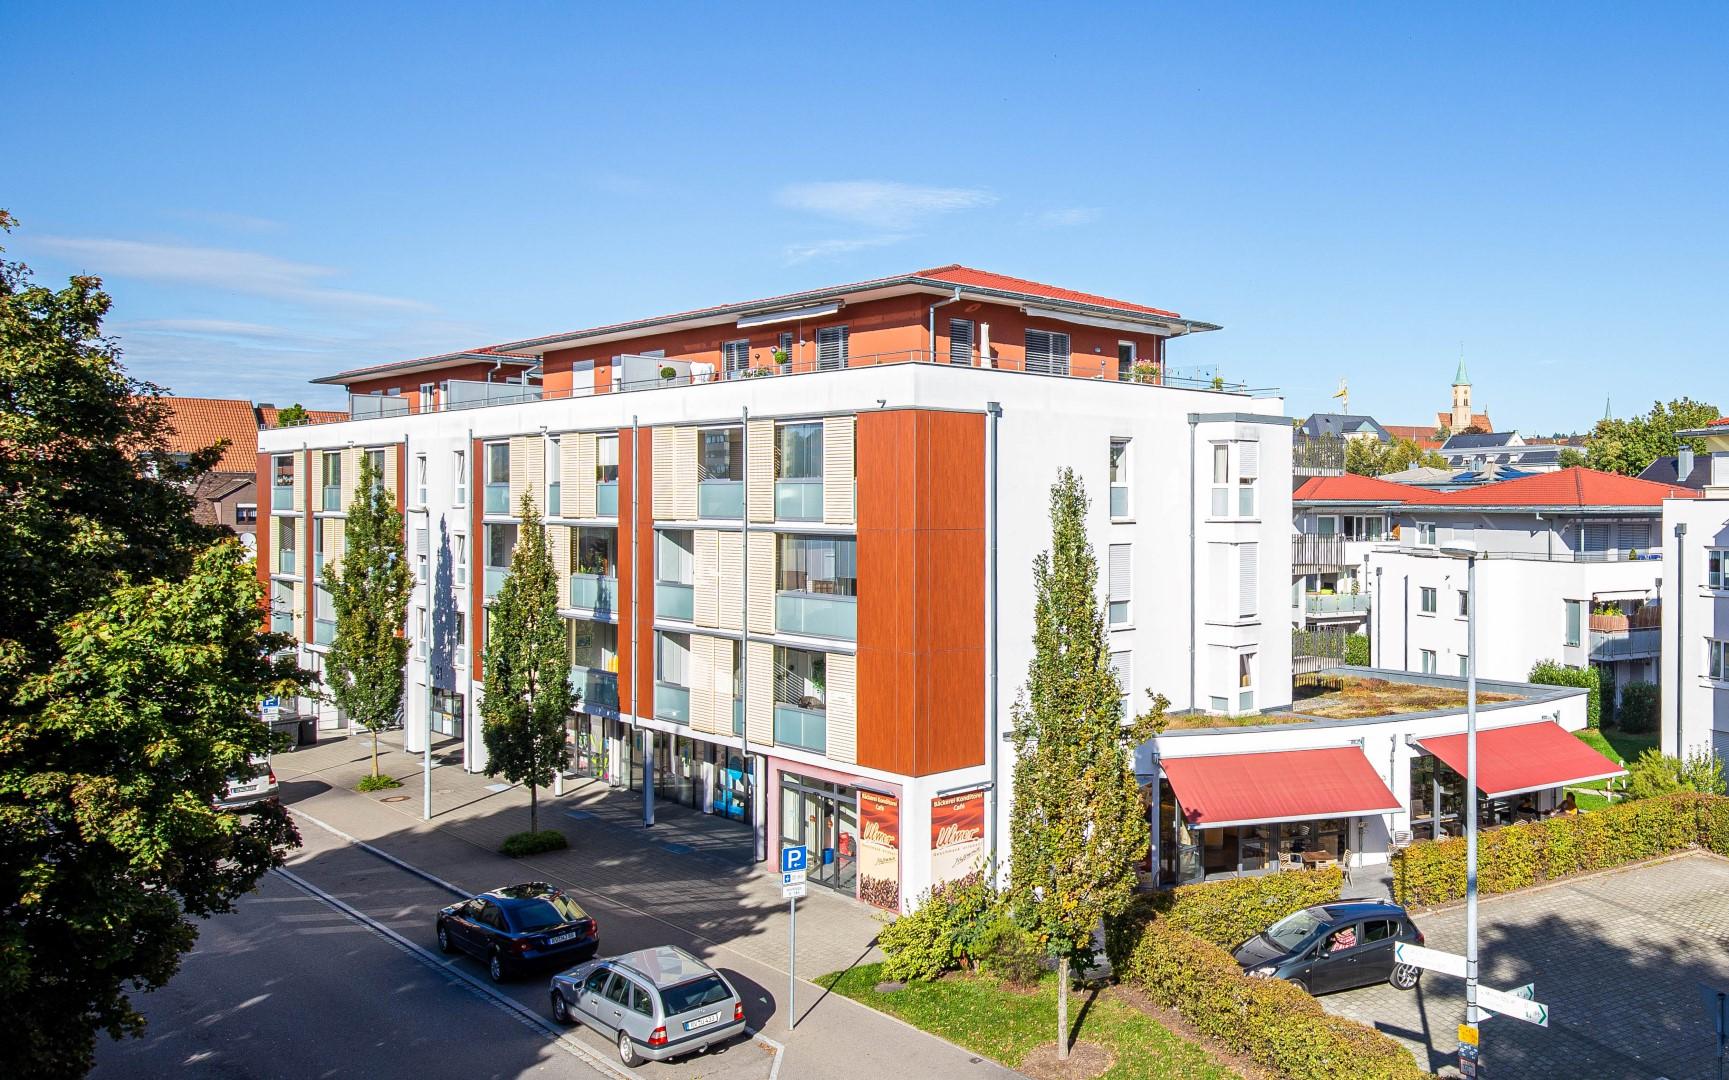 Foto unseres Bauvorhabens Schiller Residence in der Ravensburger Südstadt